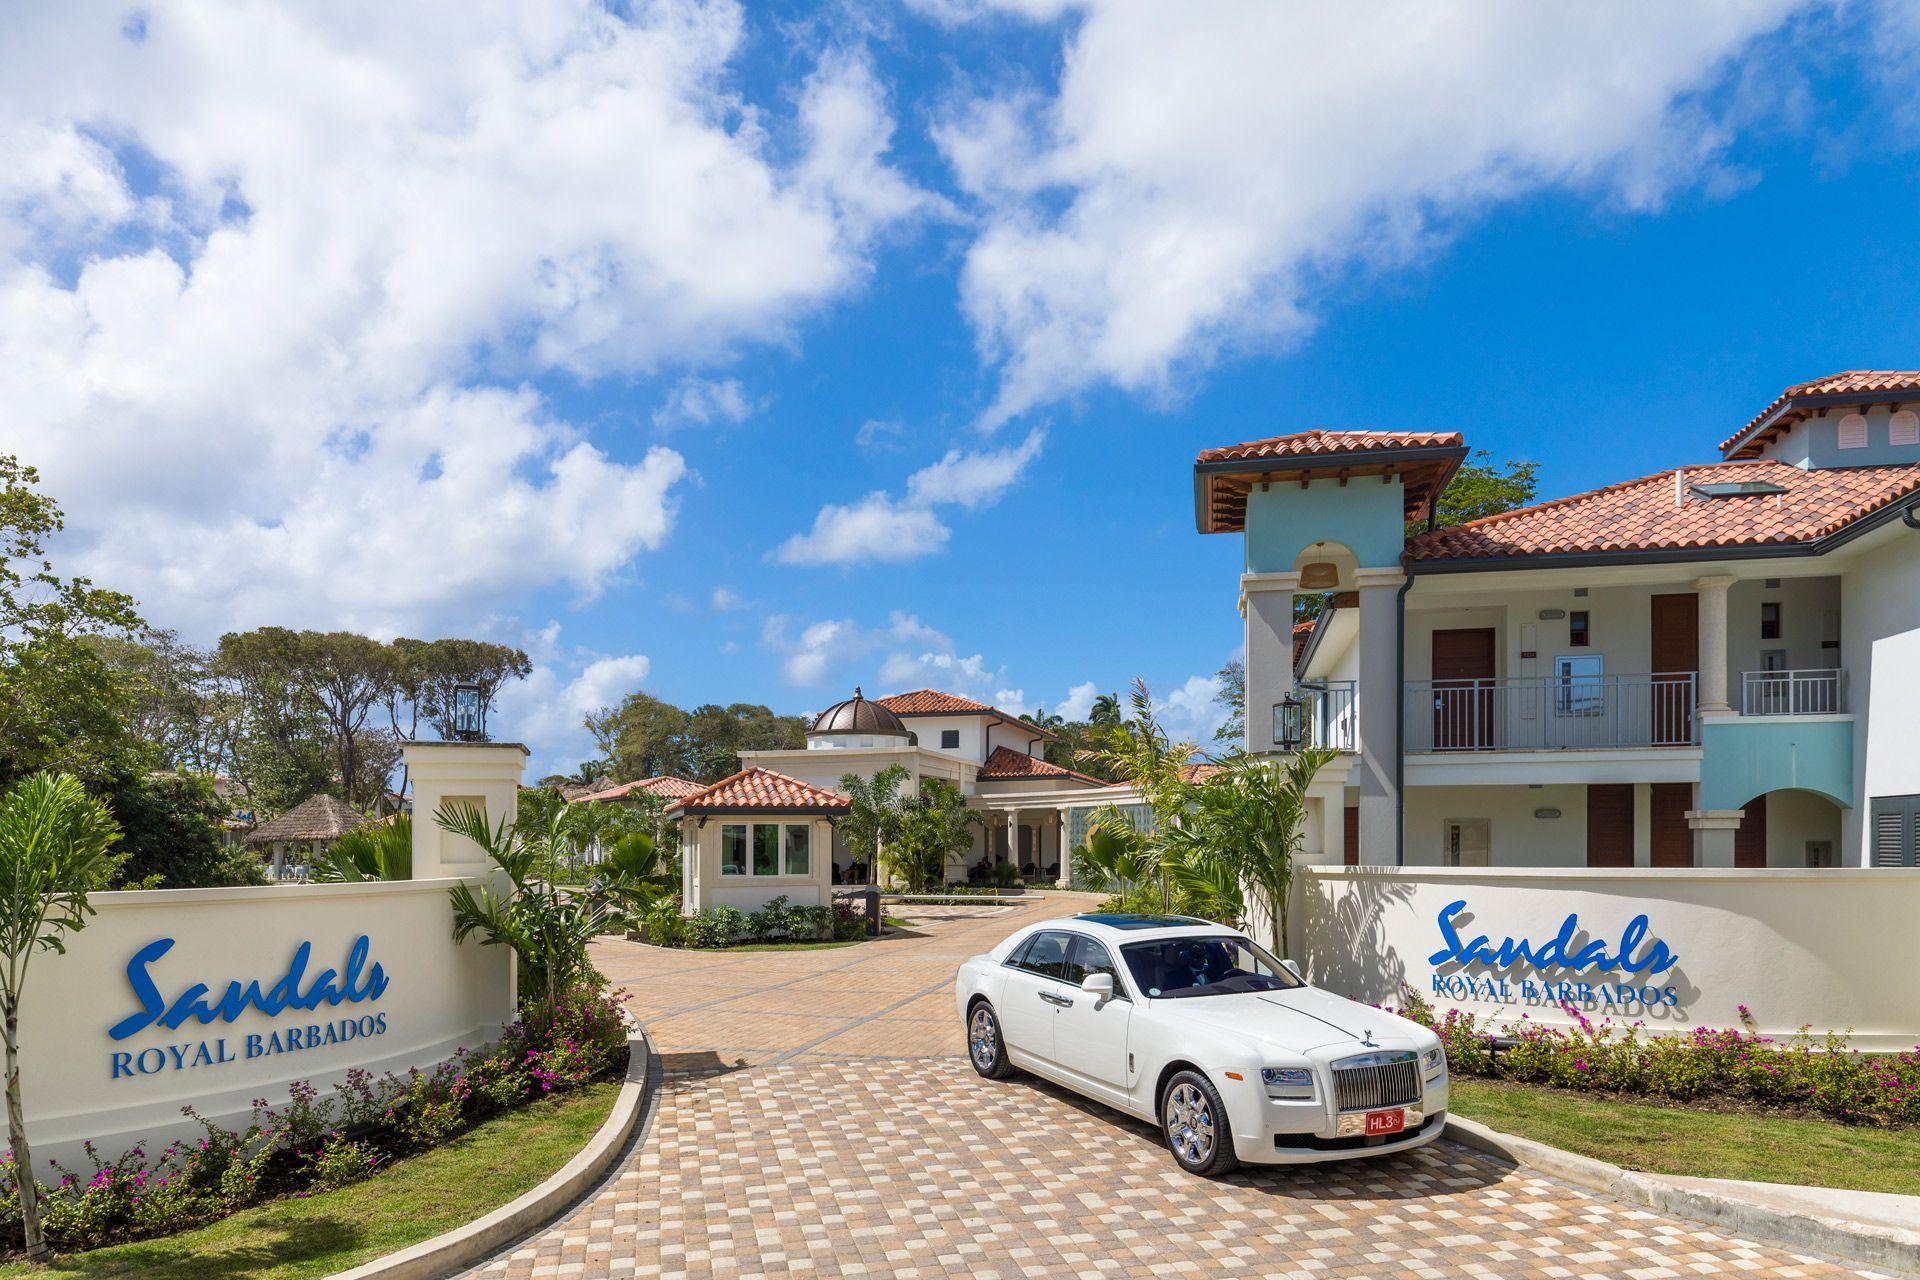 Sandals Royal Barbados Entrance Rolls Royce